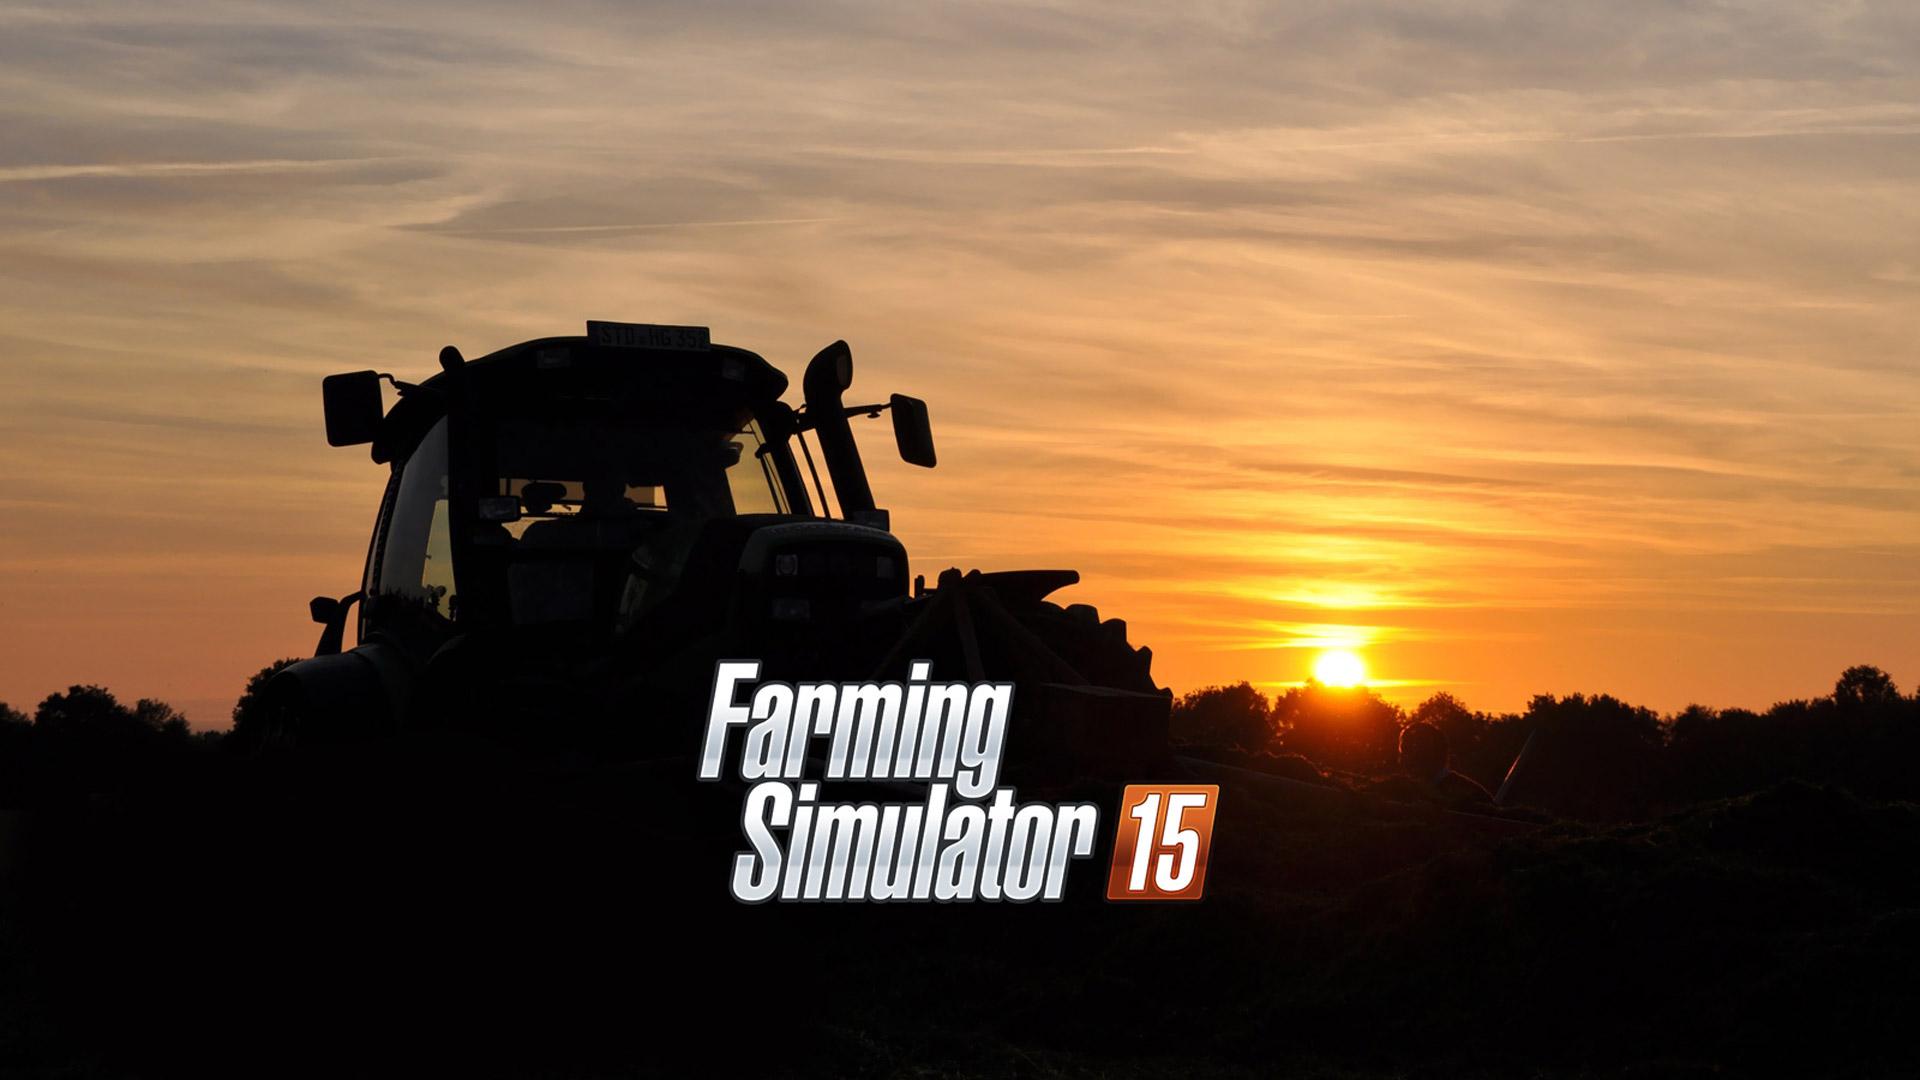 Free Farming Simulator 15 Wallpaper in 1920x1080